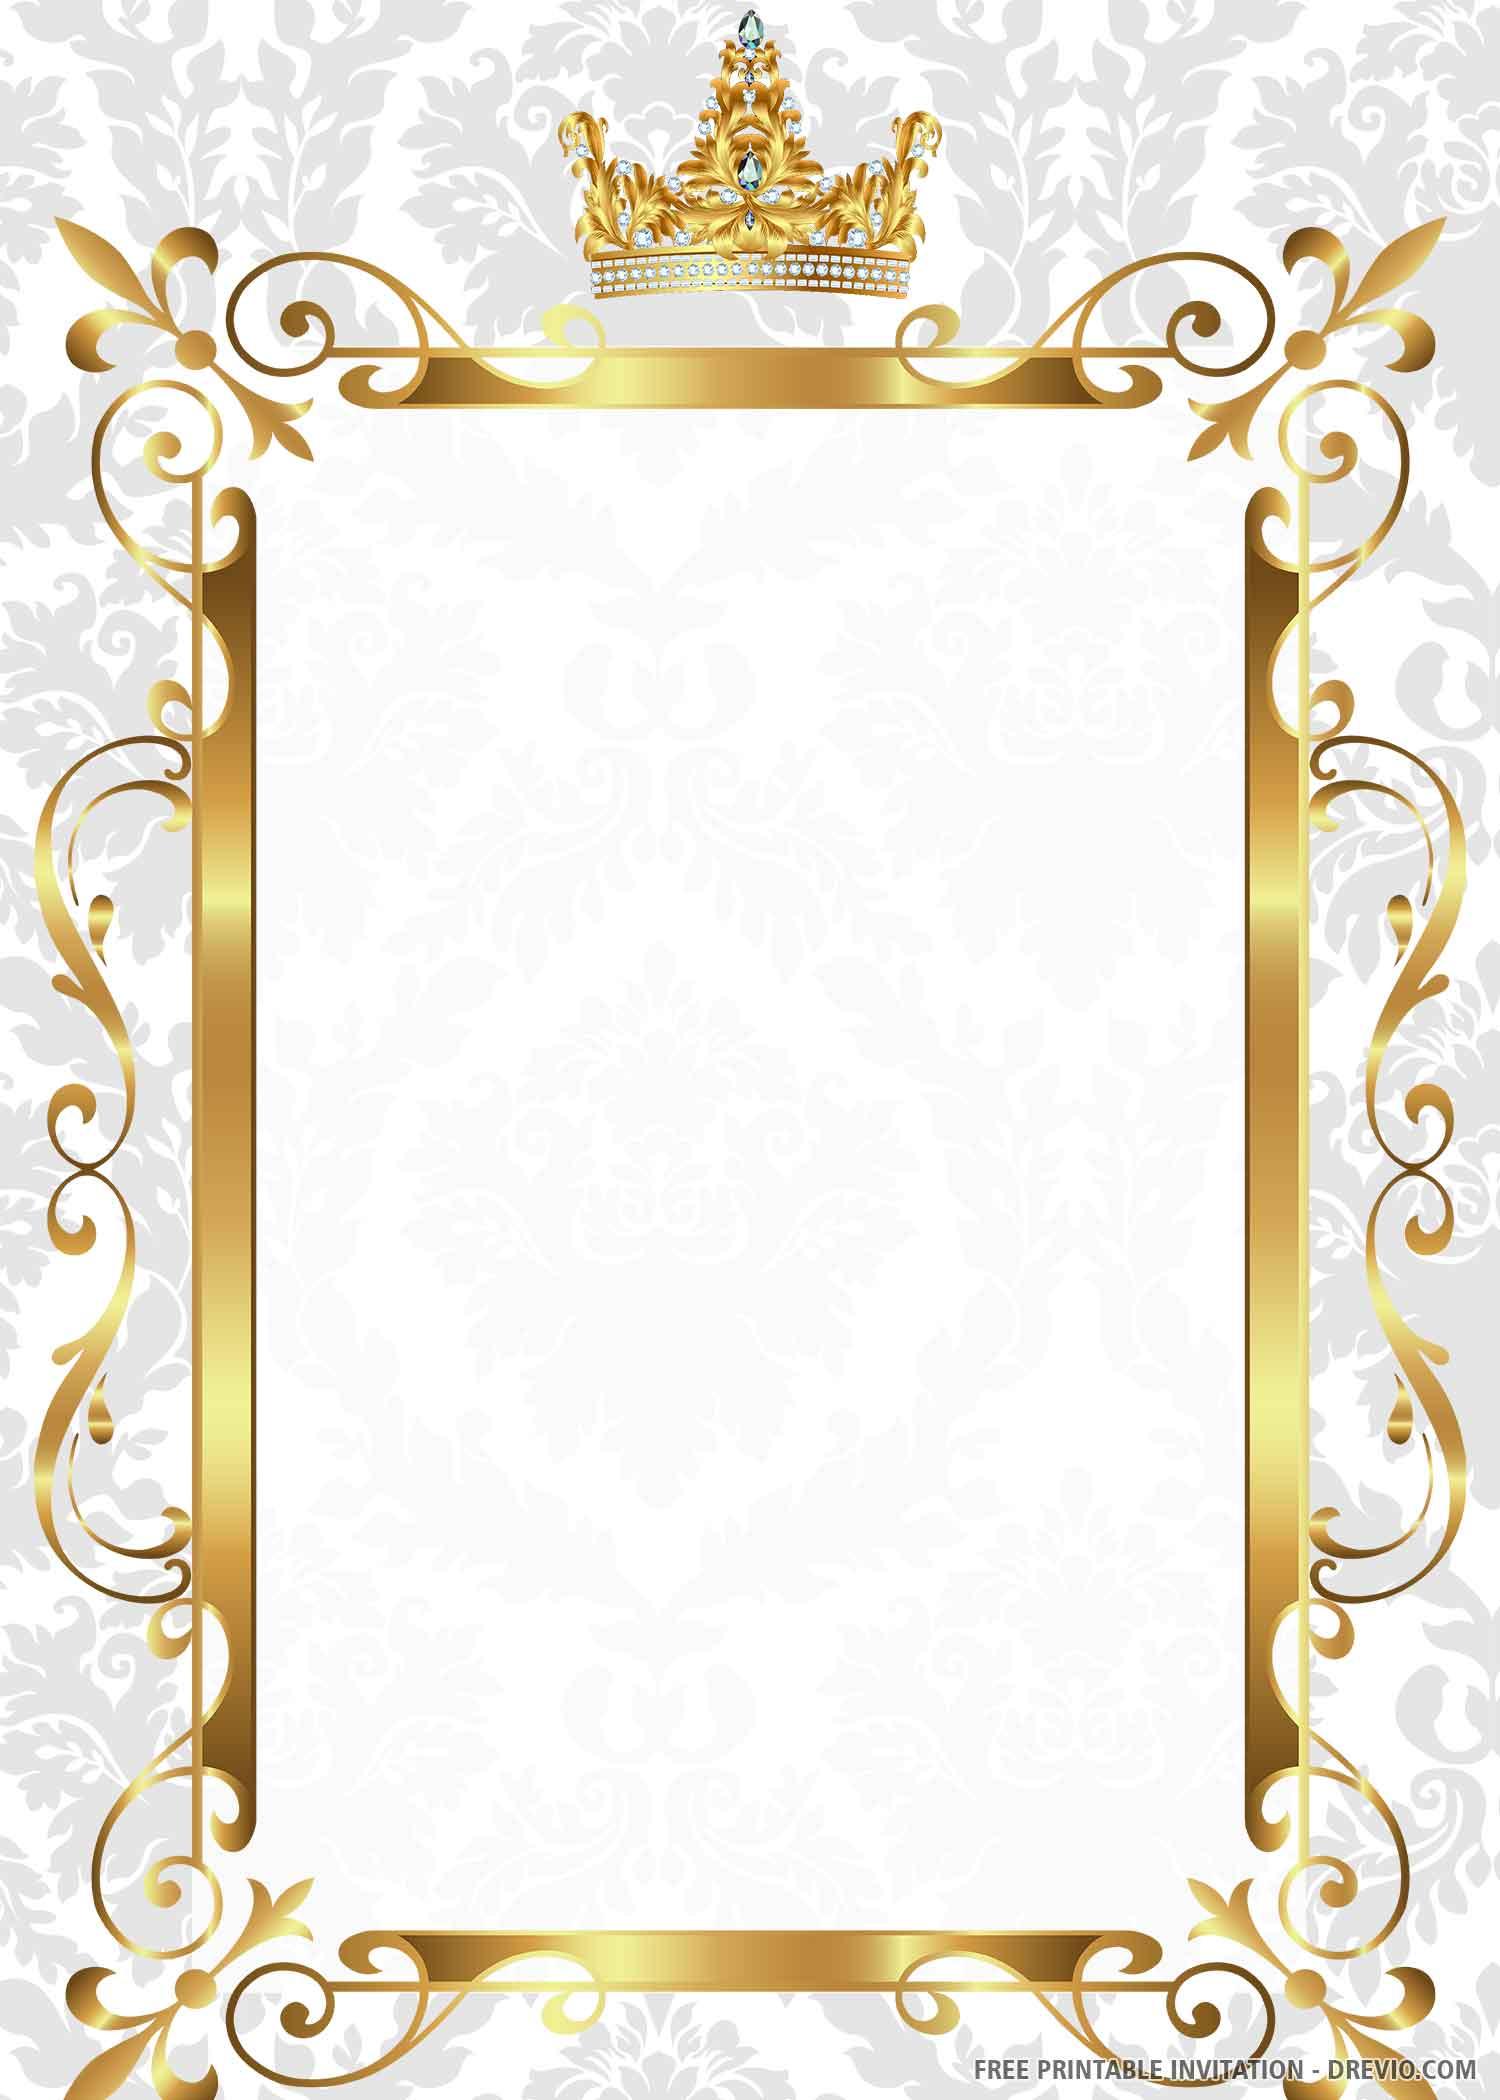 Free Printable Gold Royal Wedding Invitation Templates